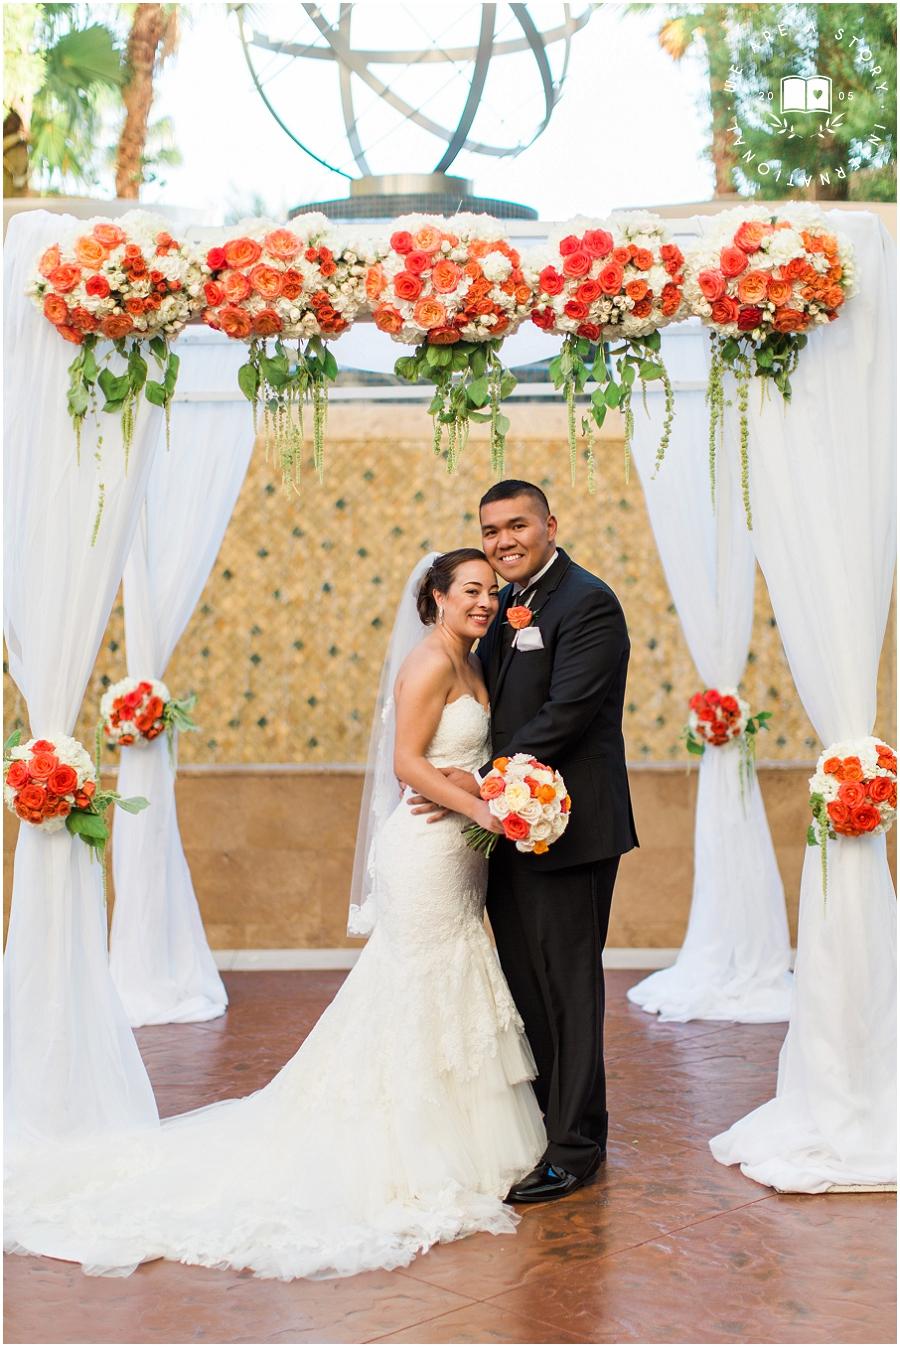 Four Seasons wedding photographer Las Vegas _ We Are A Story wedding photographer_2496.jpg